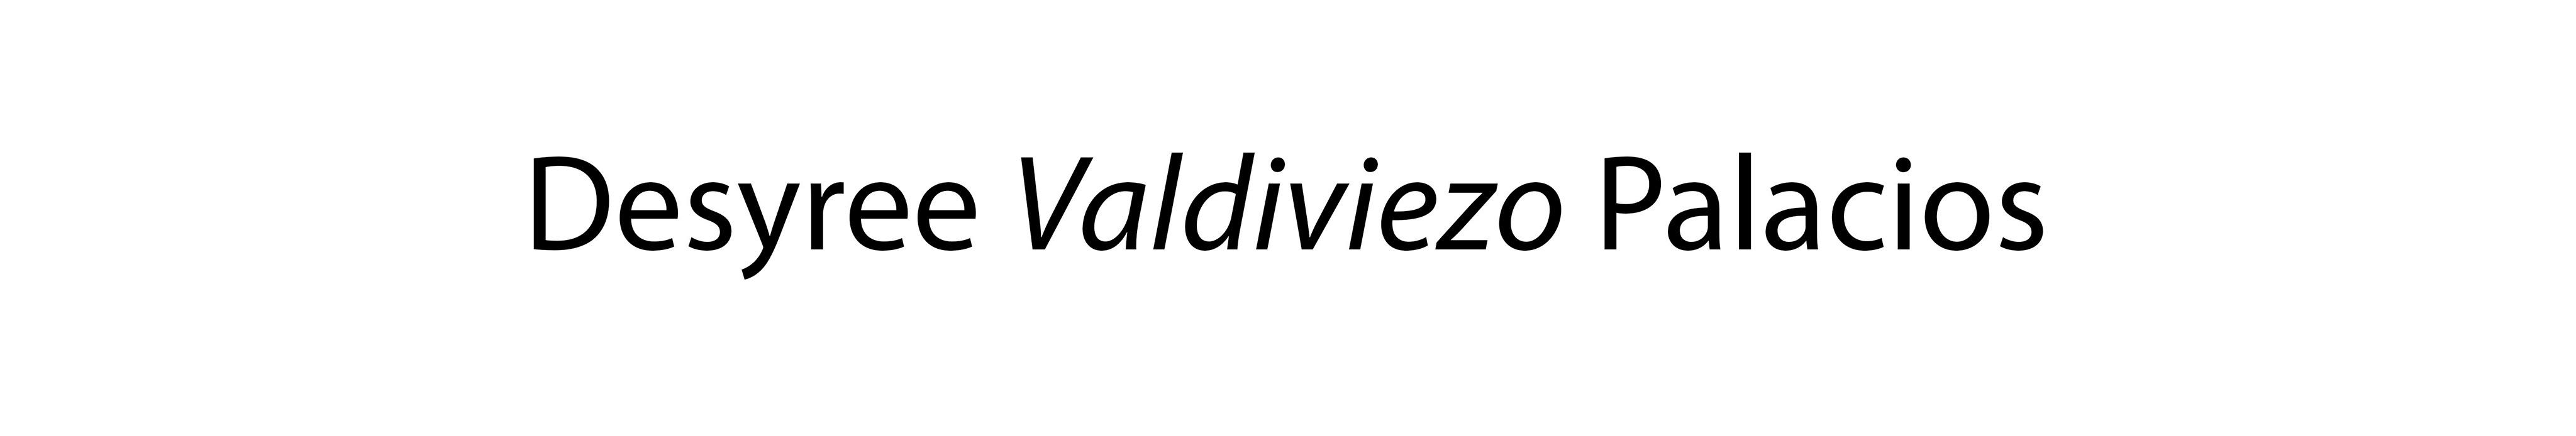 Desyree Valdiviezo